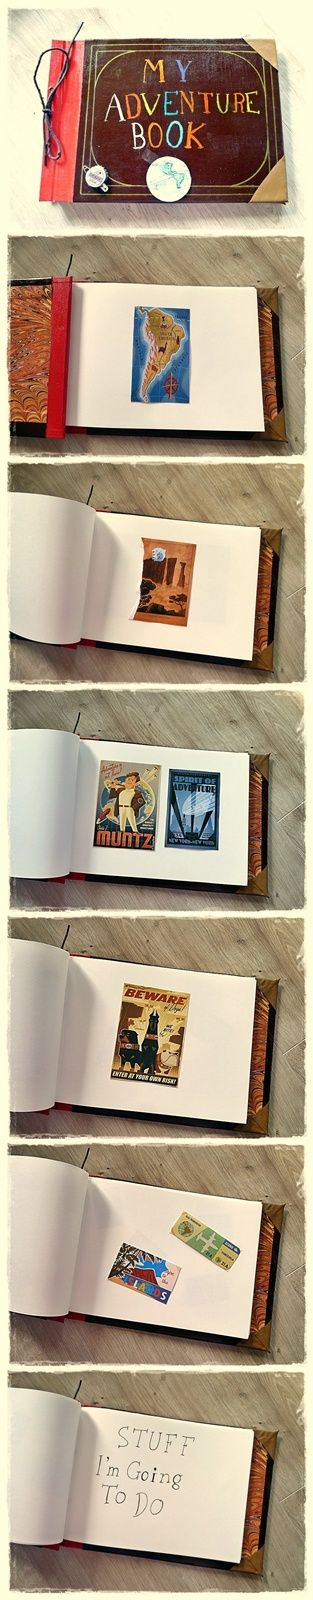 Adventure Book Tutorial - UP Pixar - Cosplay.com